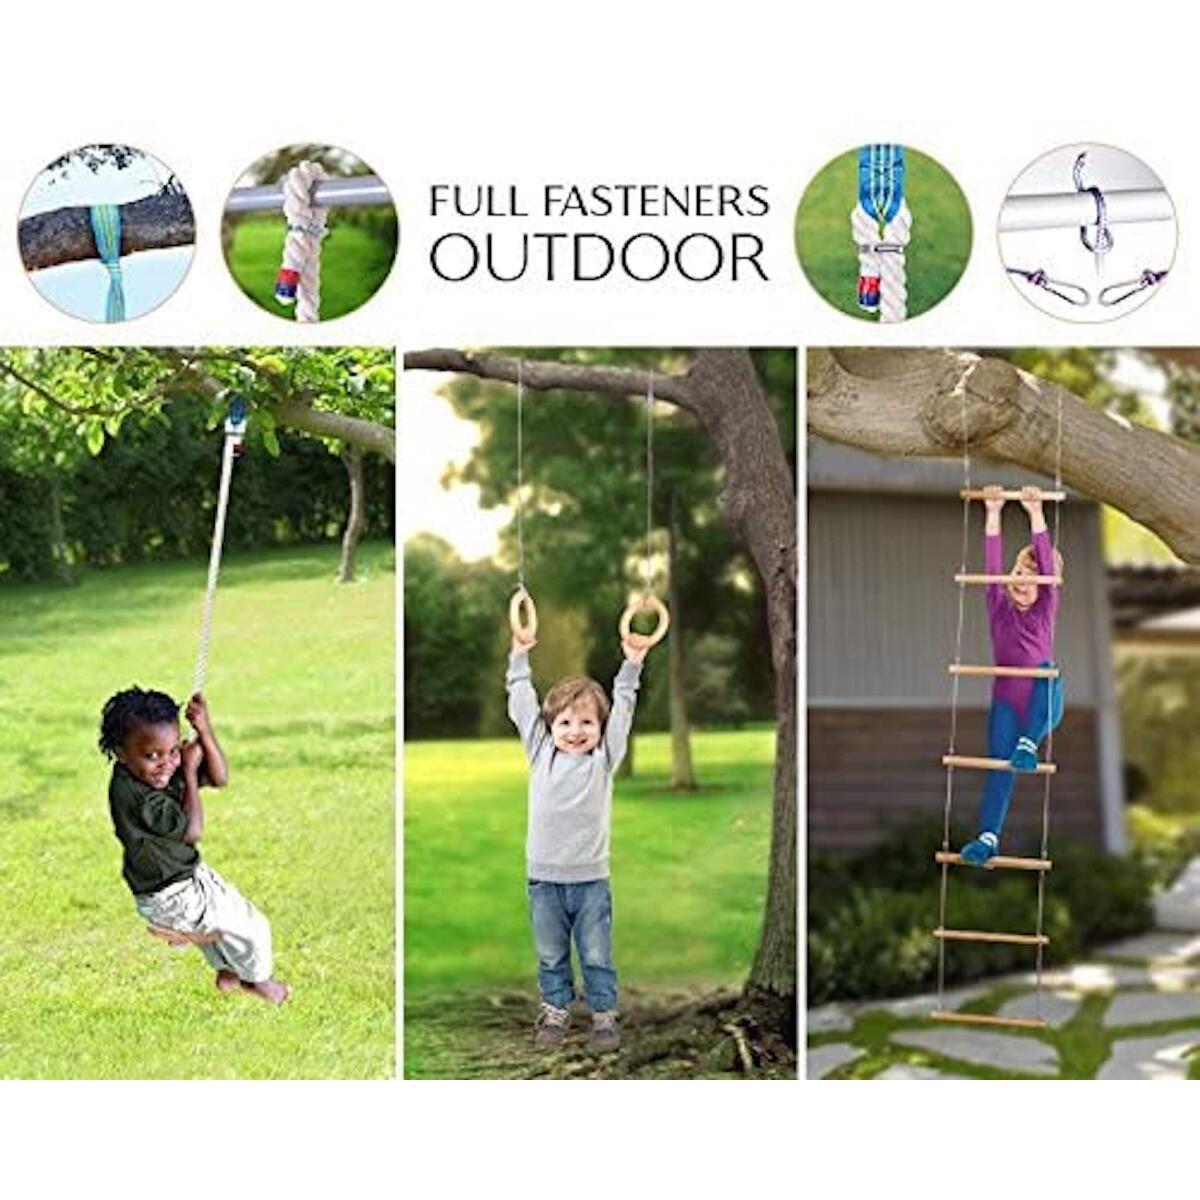 EVAS Kids gym play set – Gymnastics kit include swing, climbing ladder, gymnastics rings